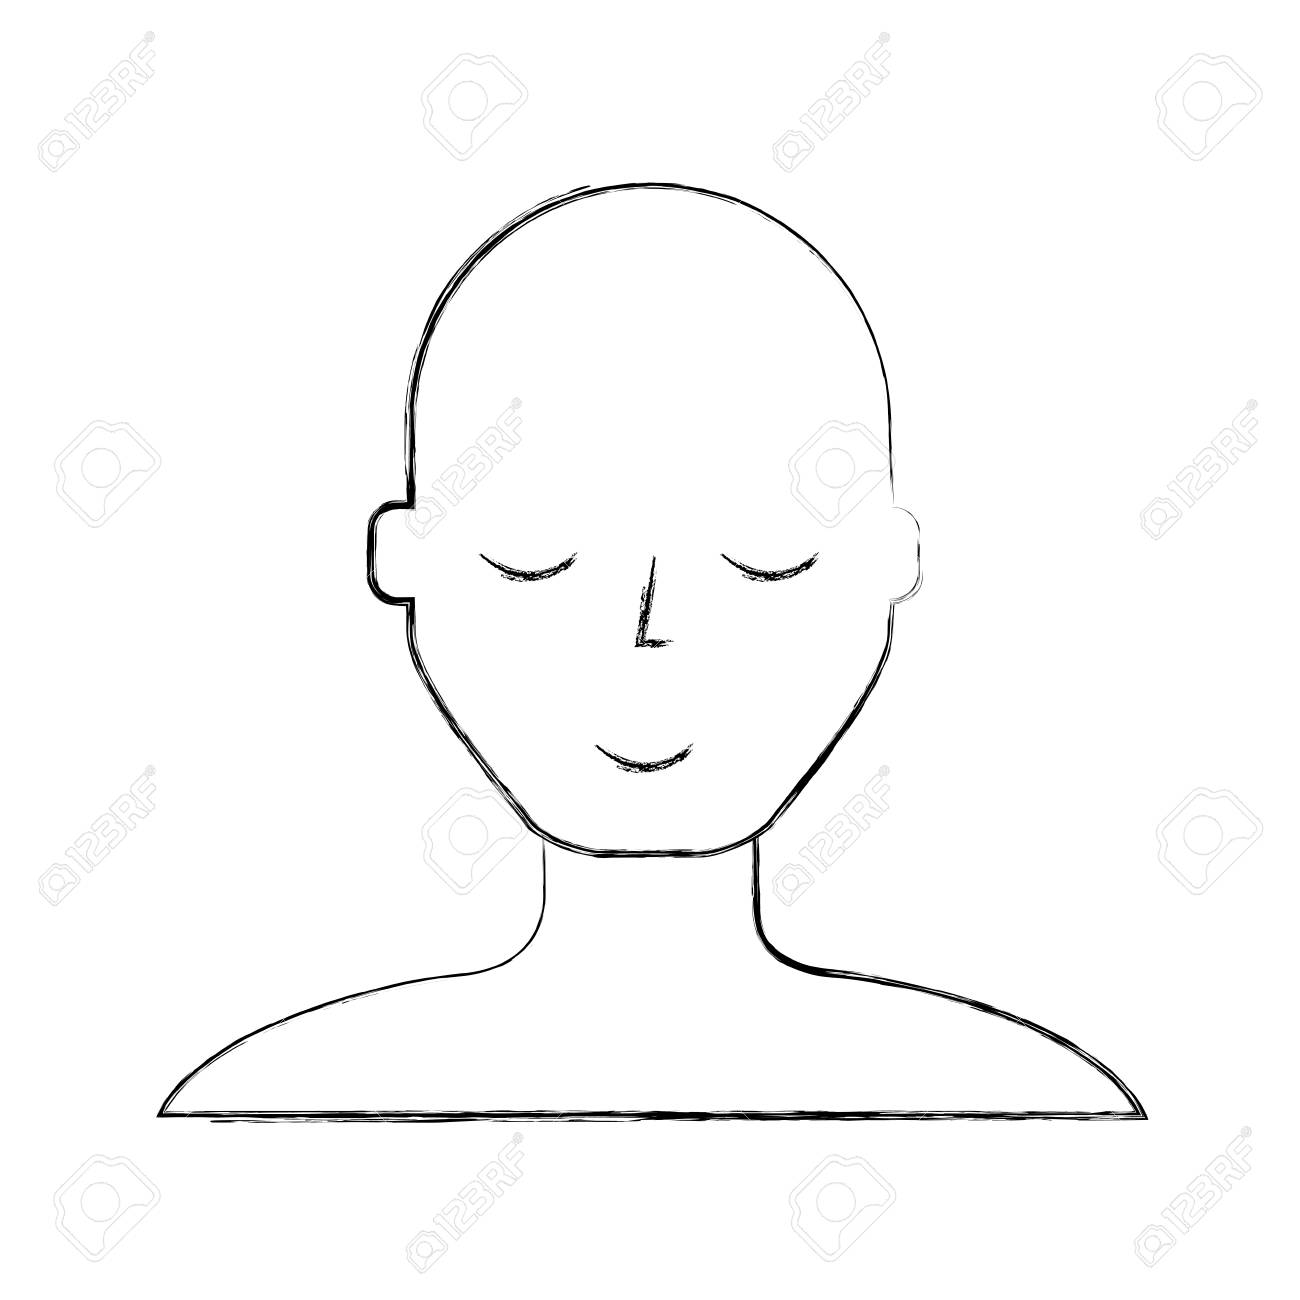 sketch draw bald man face cartoon vector graphic design royalty free rh 123rf com